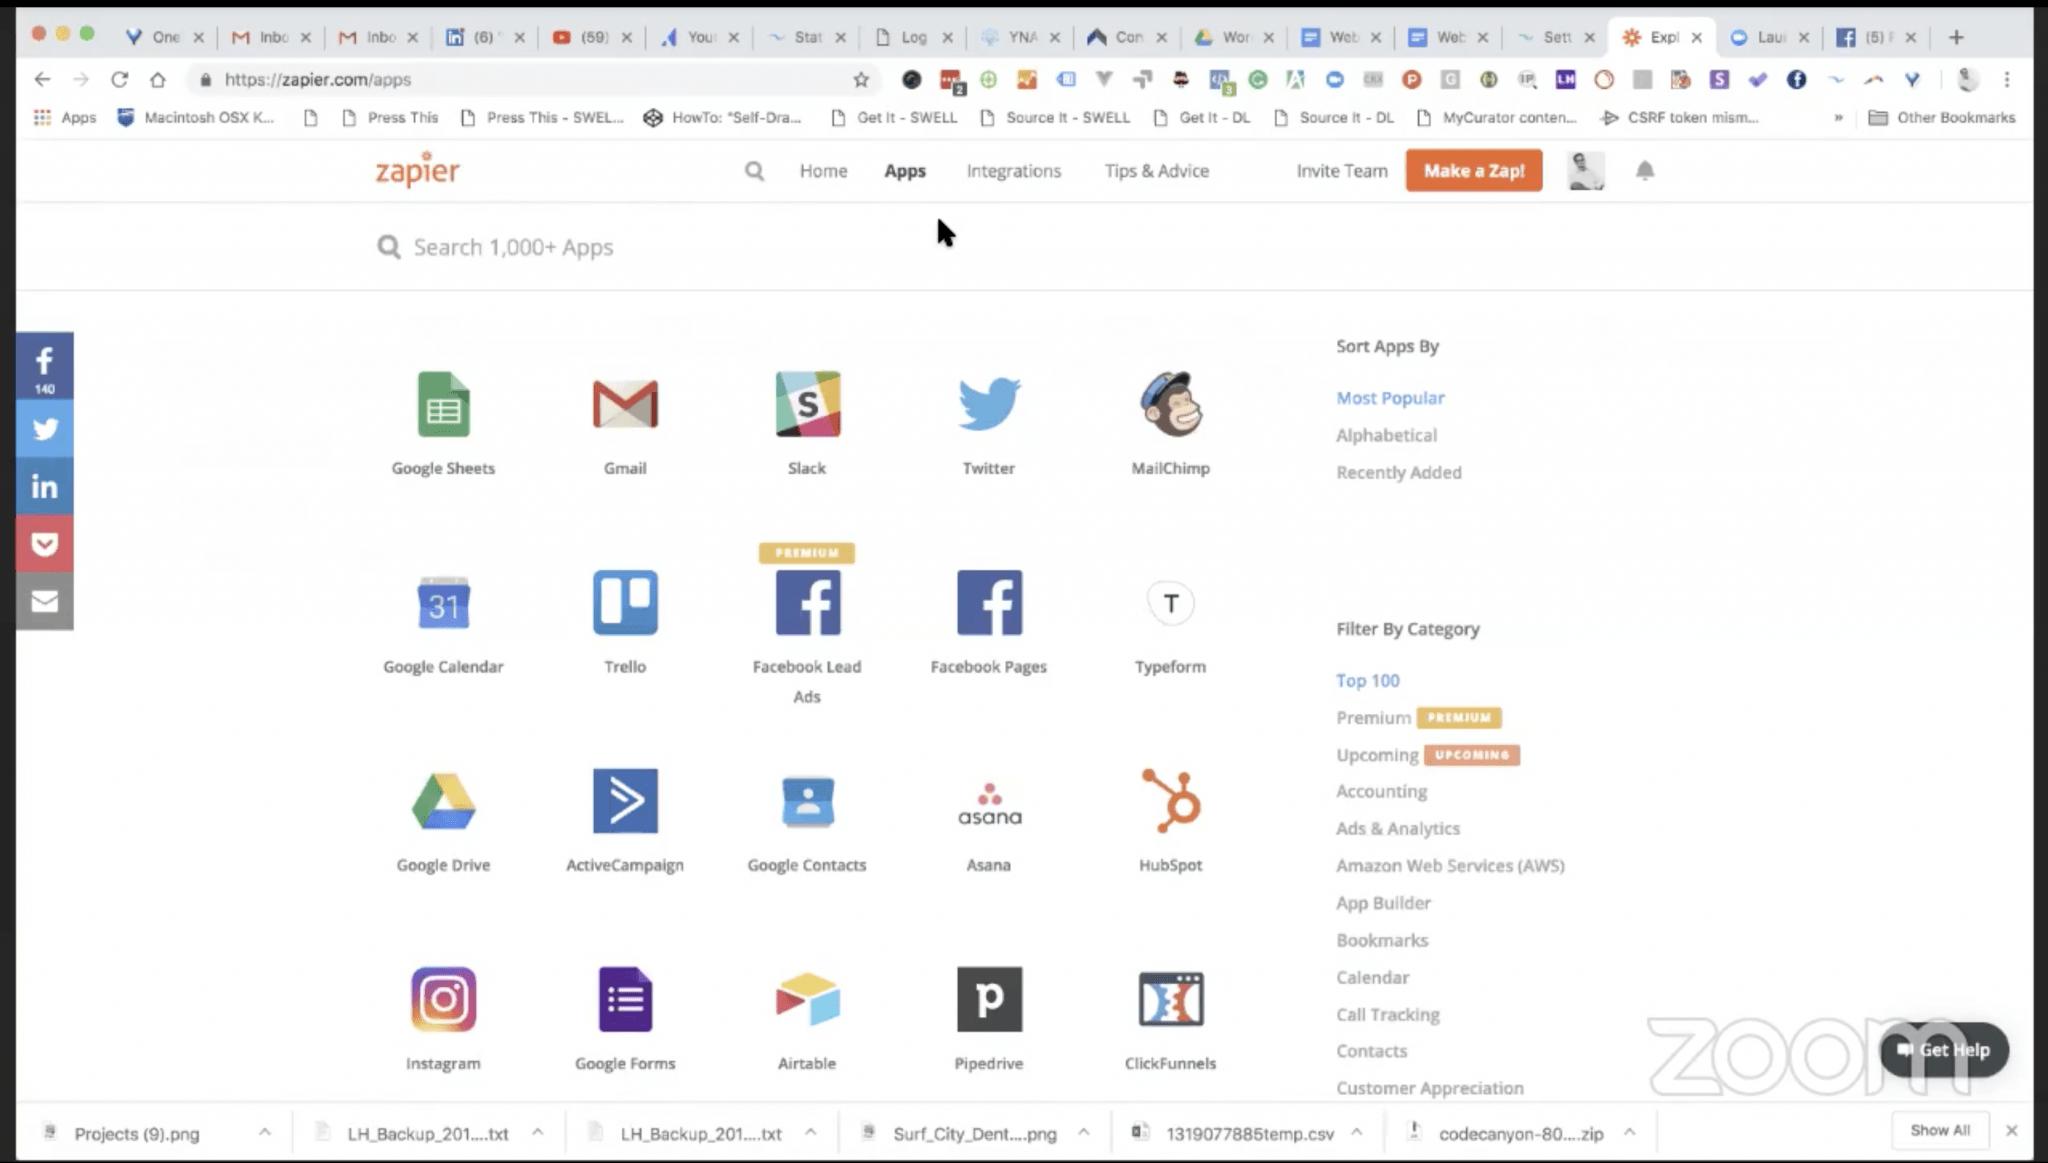 Zapier Webinar